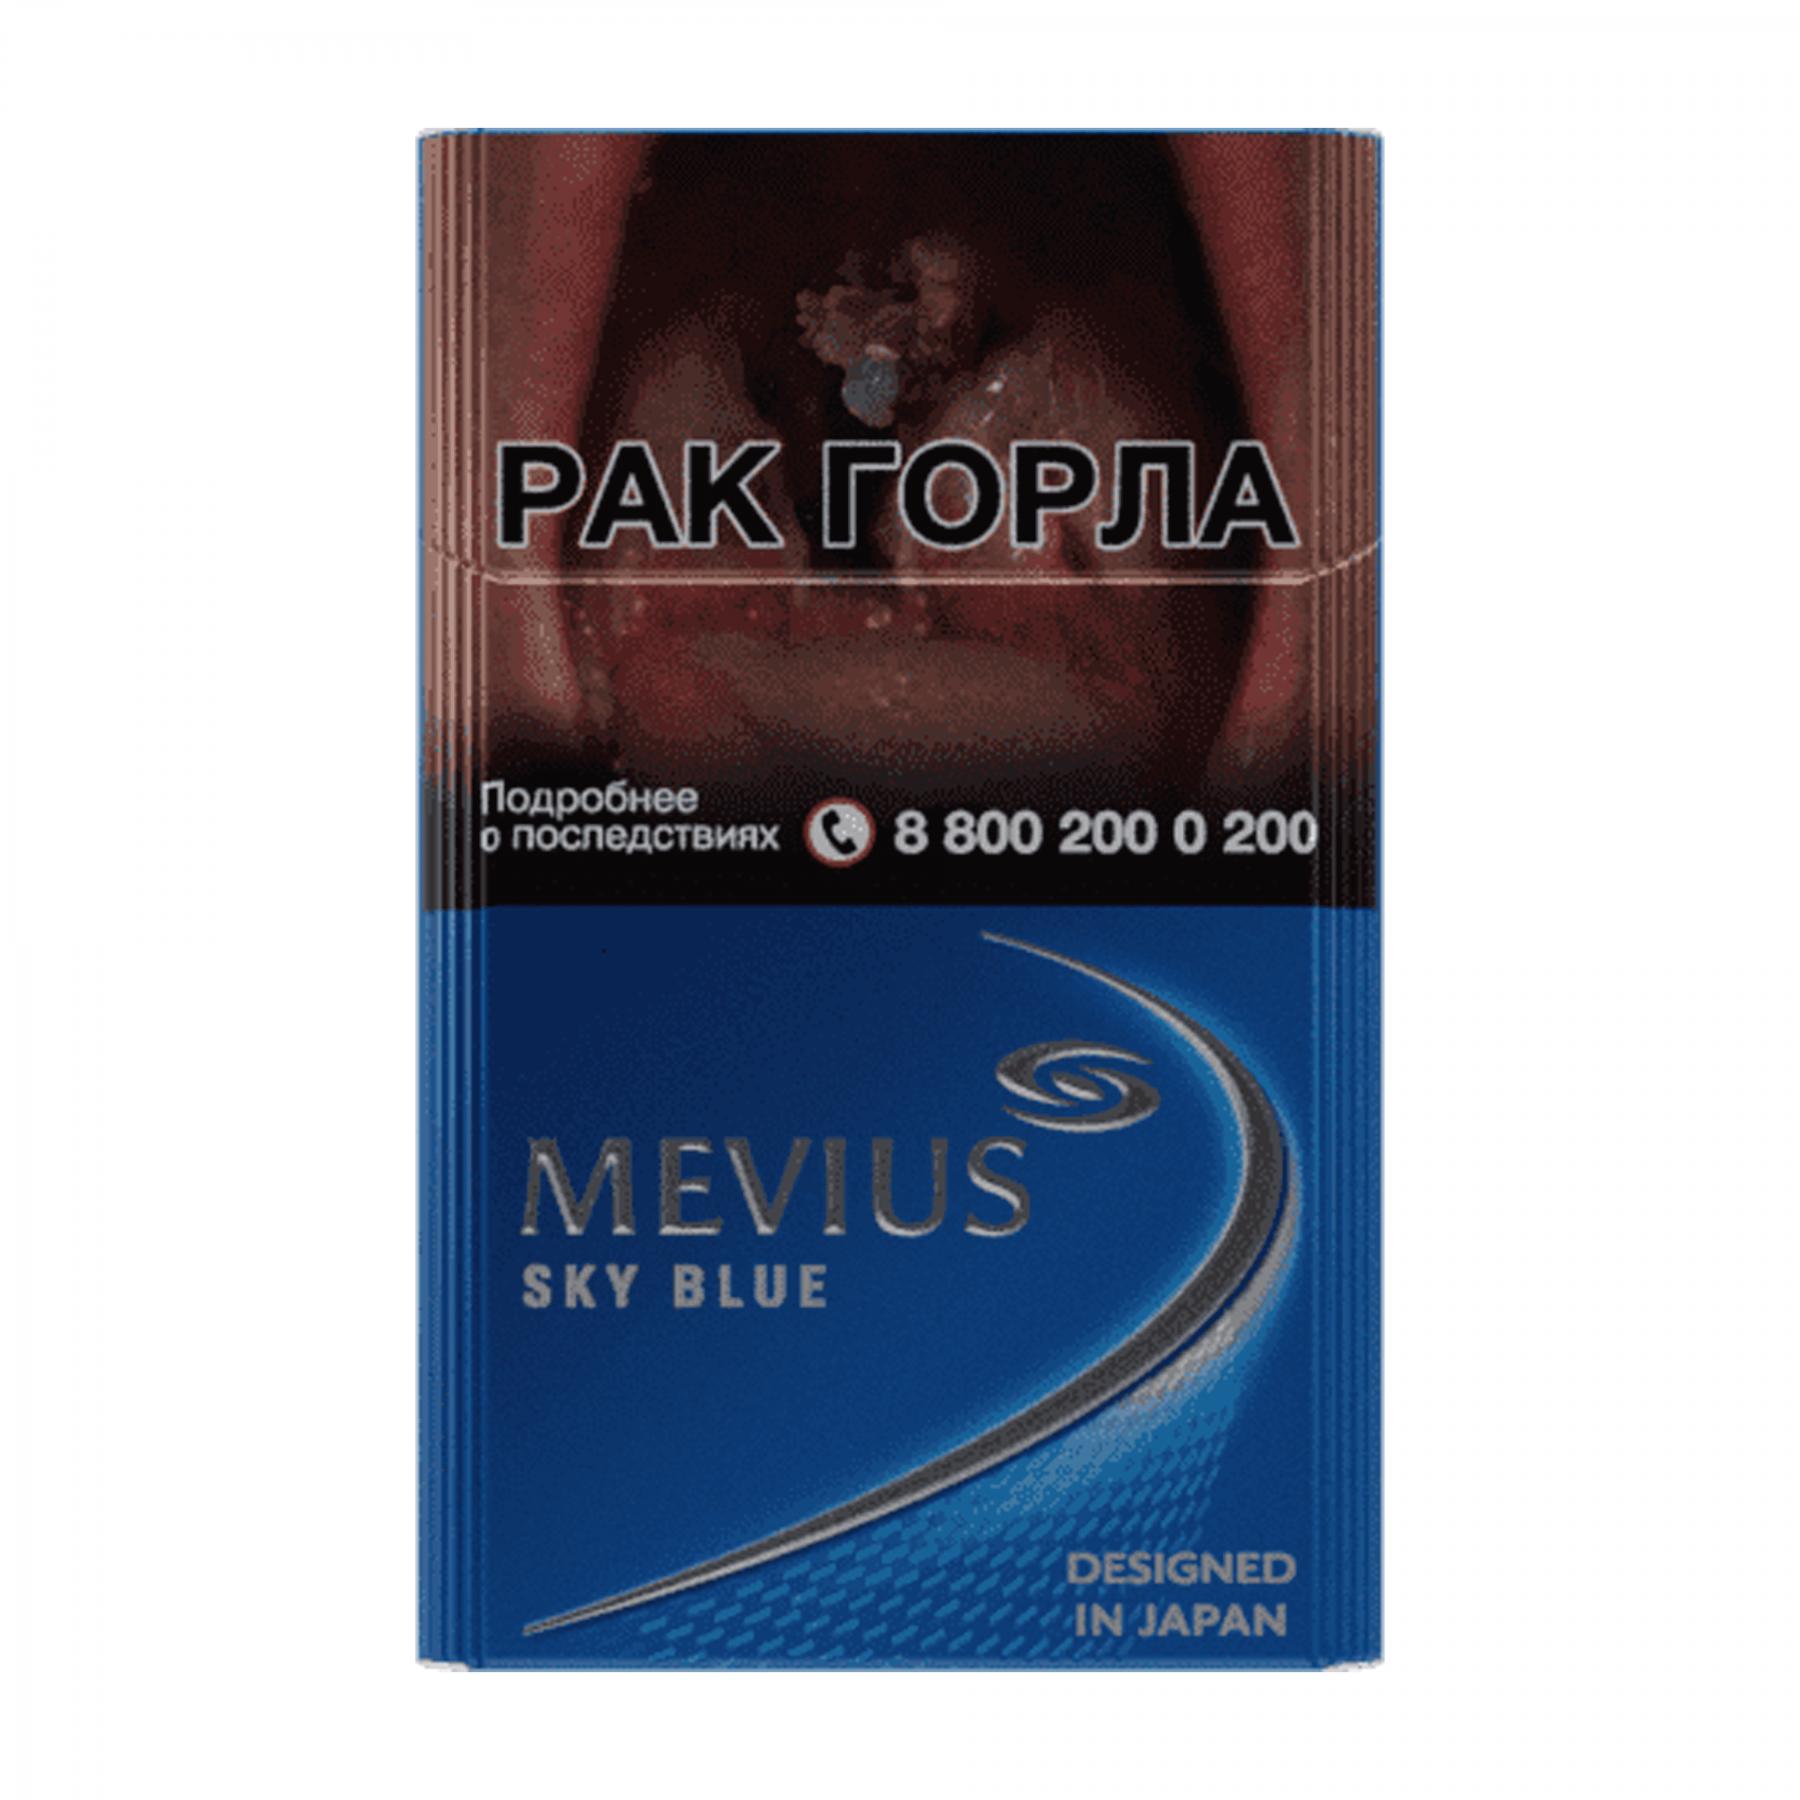 Сигареты mevius sky blue купить купить сигареты ротманс мелким оптом